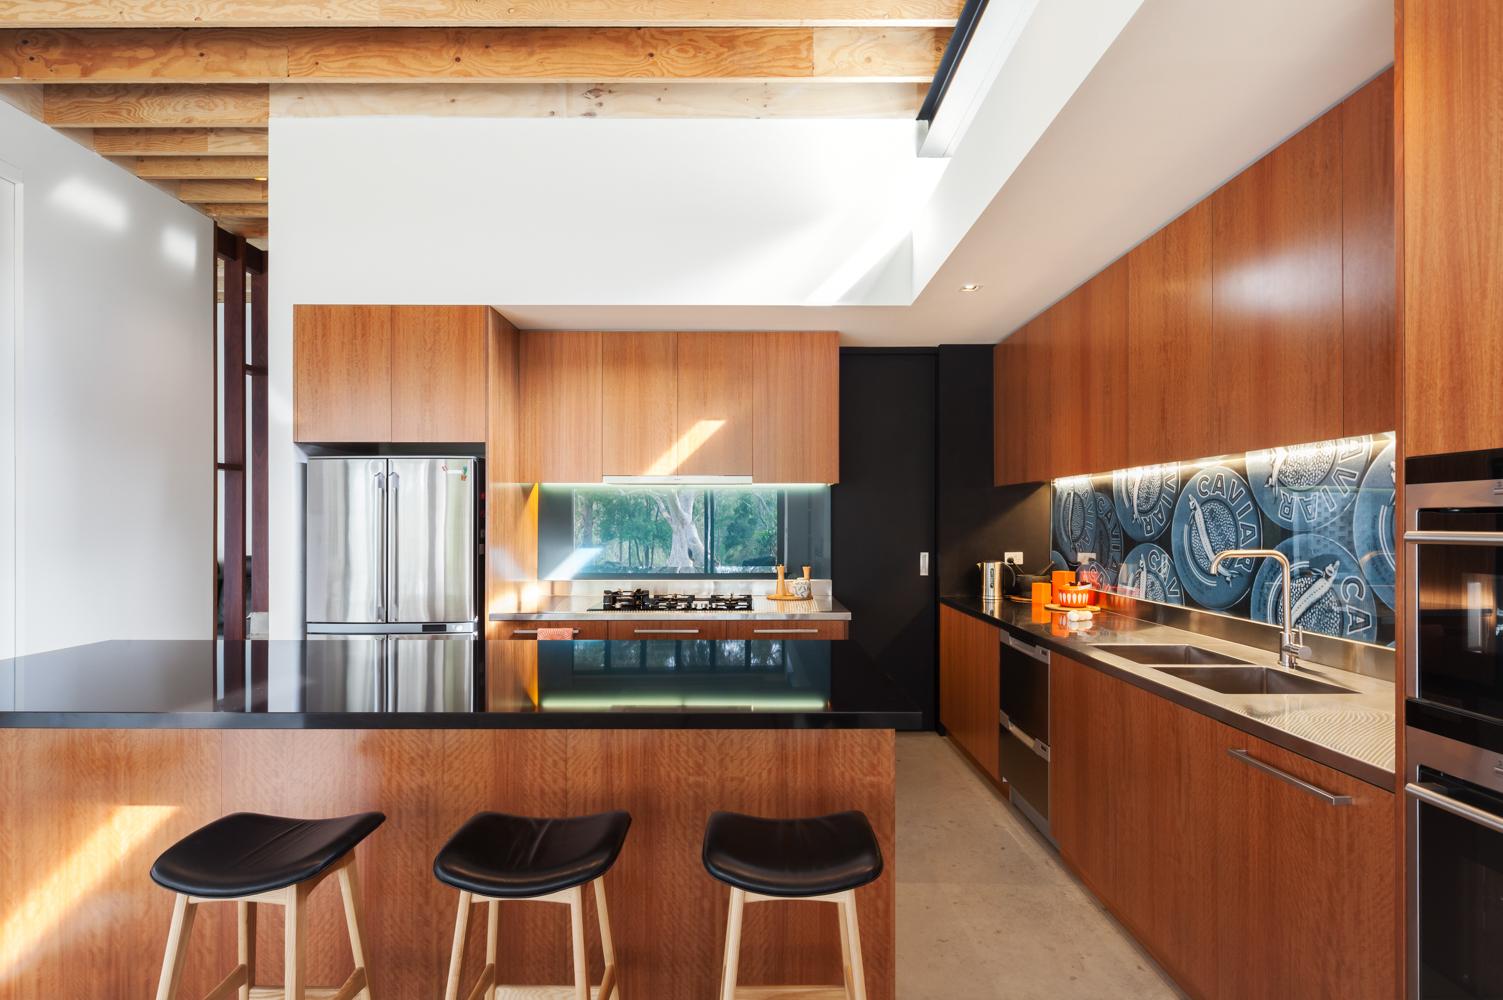 turramurra-house=noxon-giffen-architects-the-design-emotive--4.jpg